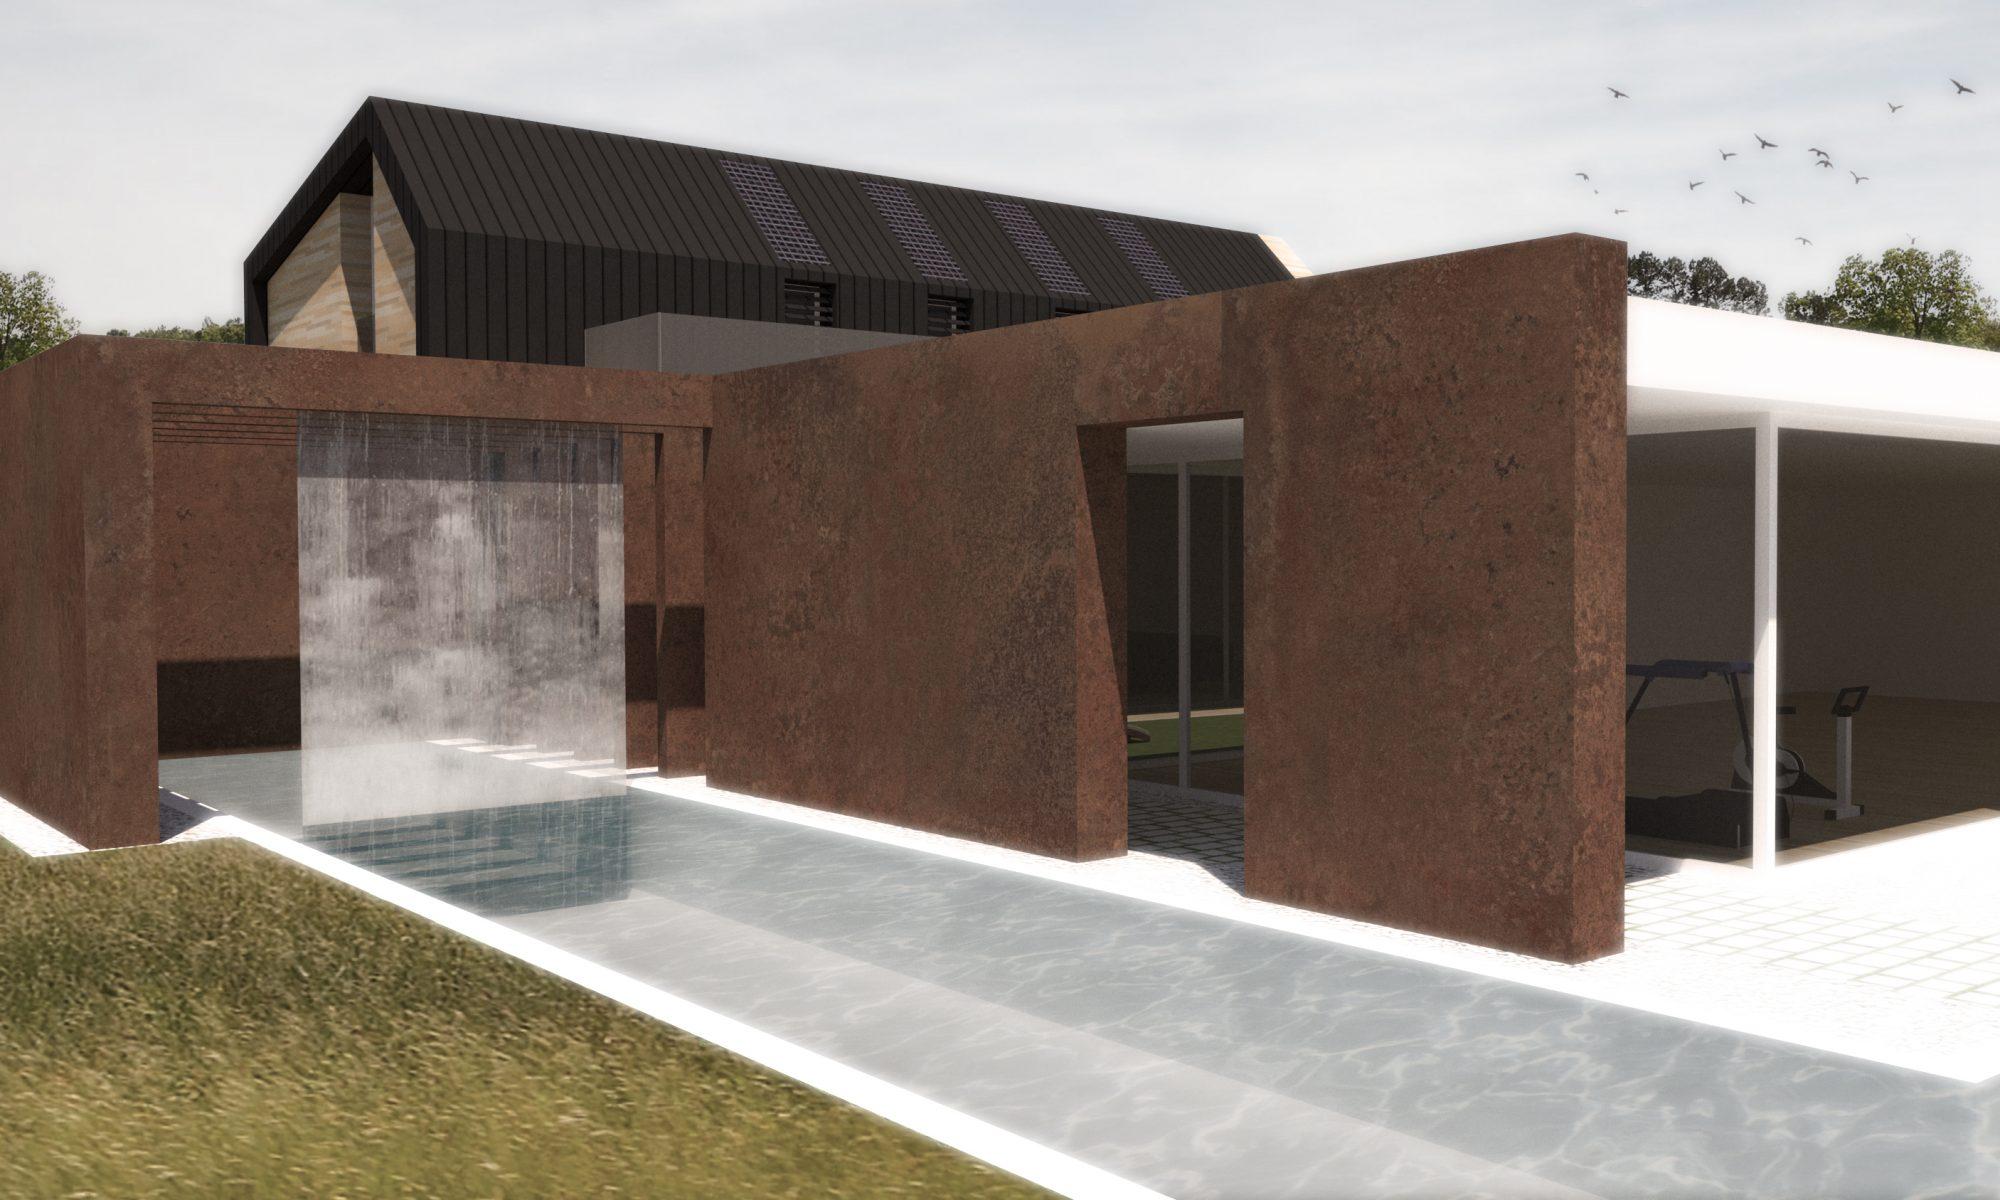 concept design for modern home